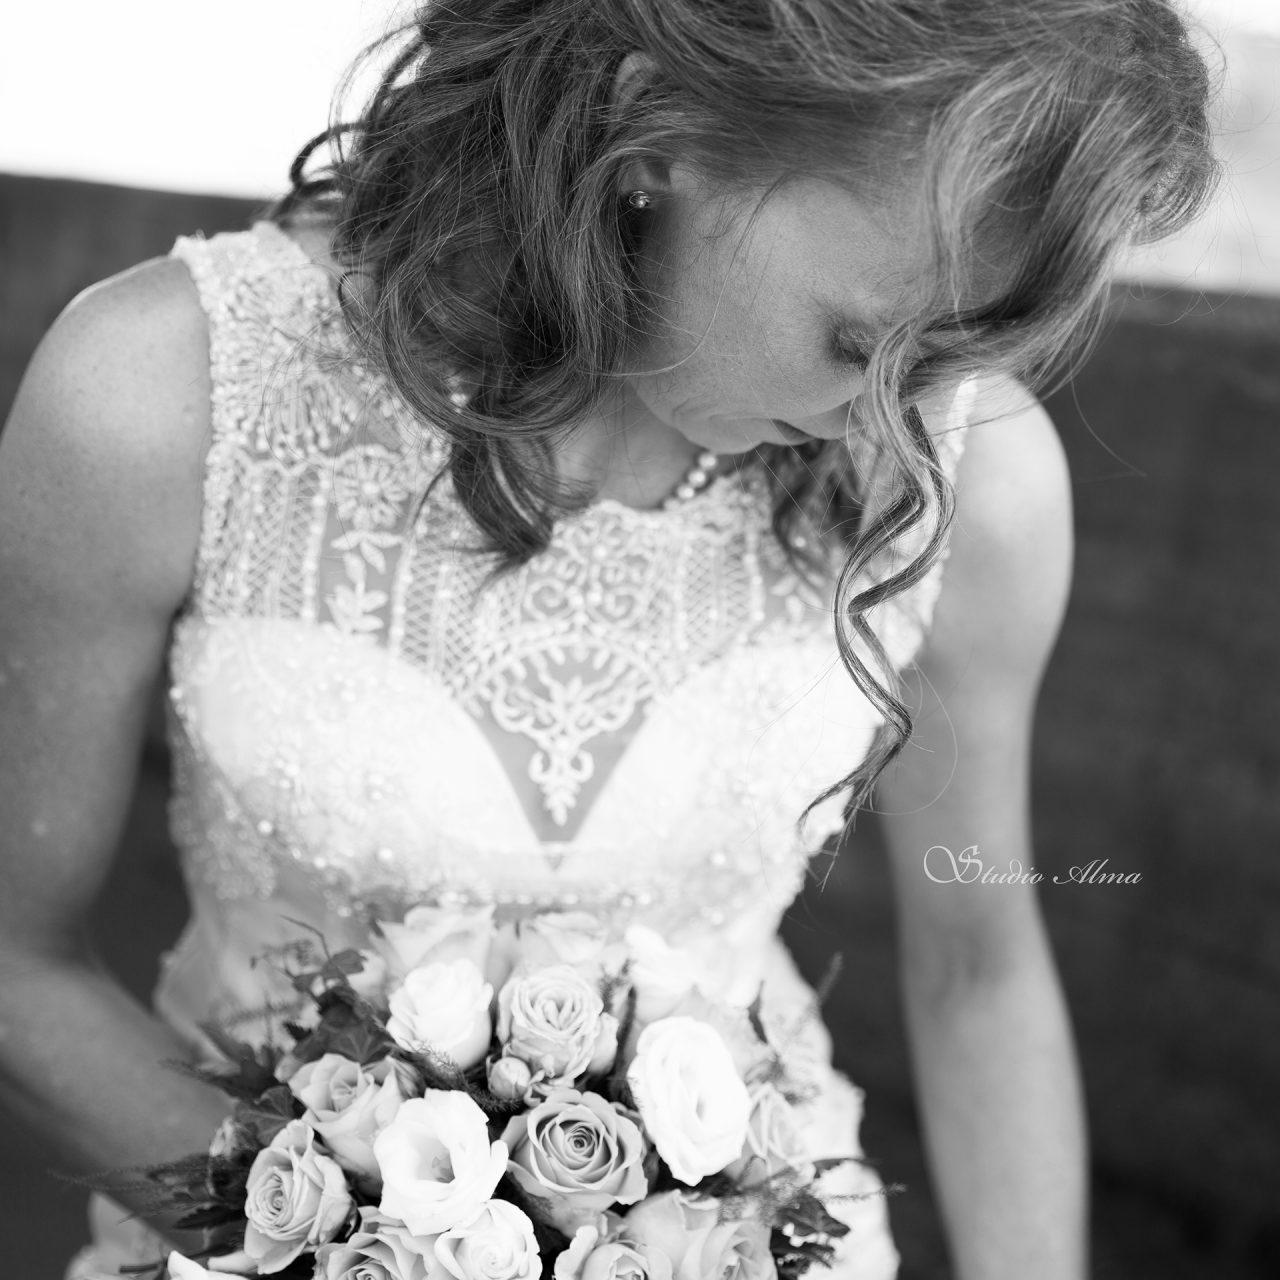 brud-bryllup-fotograf-studioalma-detaljer-brudebukett